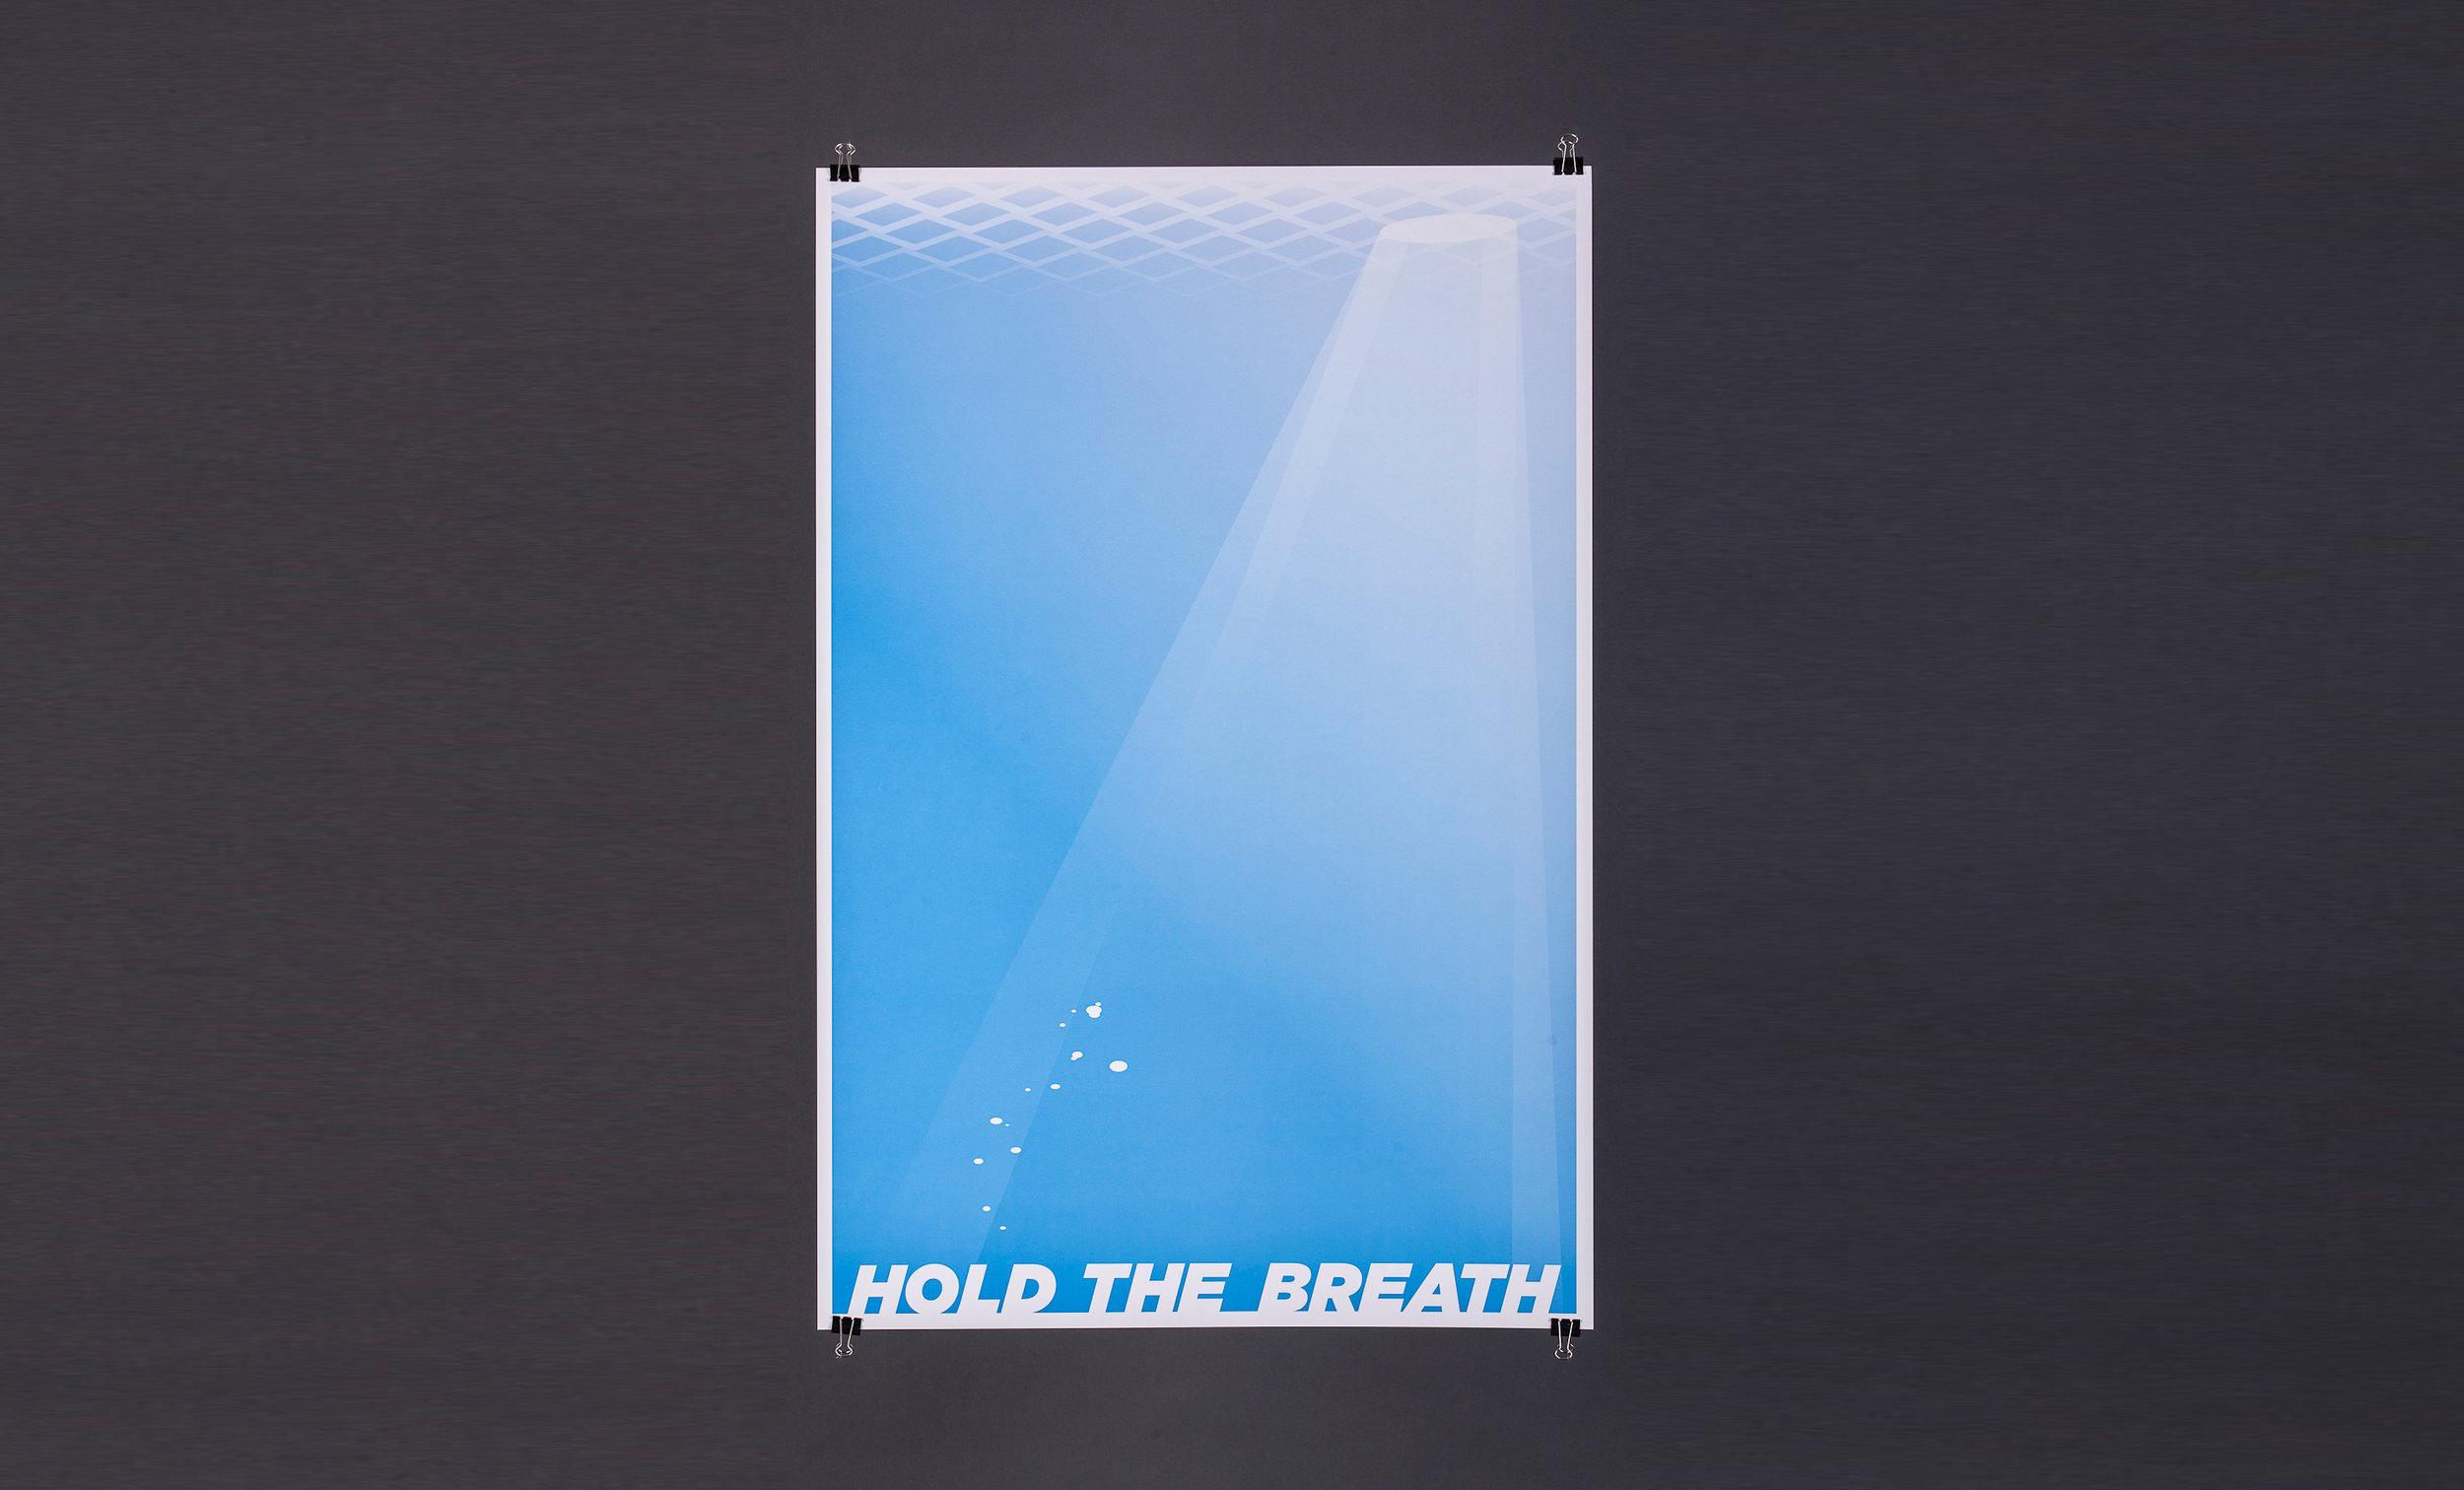 HOLD THE BREATH PRINT - print 製作HOLD THE BREATH 海報的日子,是在我剛離開正職獨立出來創立PNO 的時候,當時我對於未來帶著很多未知。這張海報的場景設定是一種像夢境般的狀態。我希望營造出望著海報的人是以主觀角度去看的感覺,他抬頭看水面的時候看見一線光,但是不確定那線光到底是生機還是另一個危機。我想透過這張海報提醒自己和同樣在疑惑中的人,不用急,先等一等,冷靜看清楚情況才作下一步。